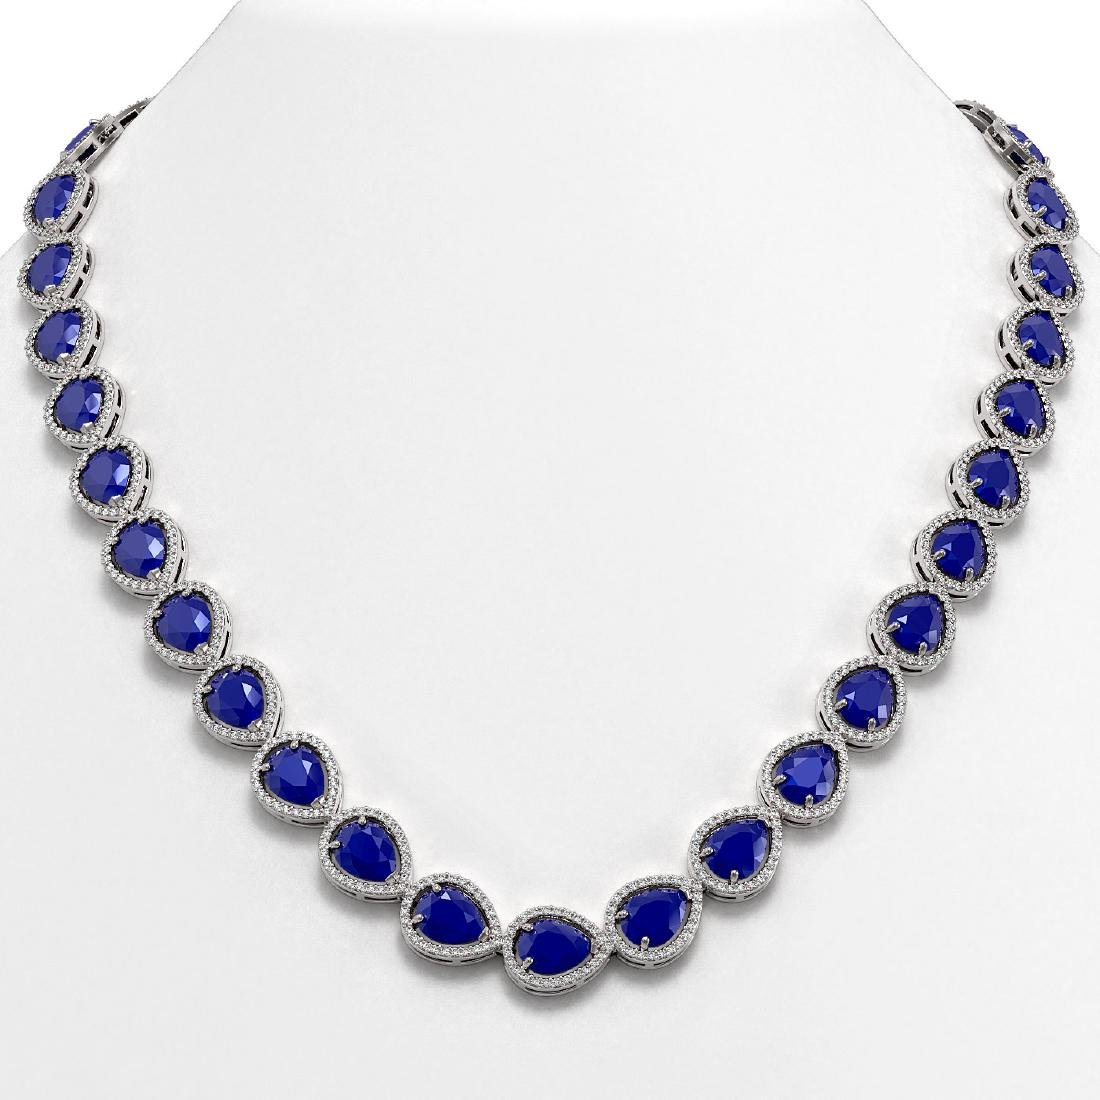 64.01 CTW Sapphire & Diamond Halo Necklace 10K White